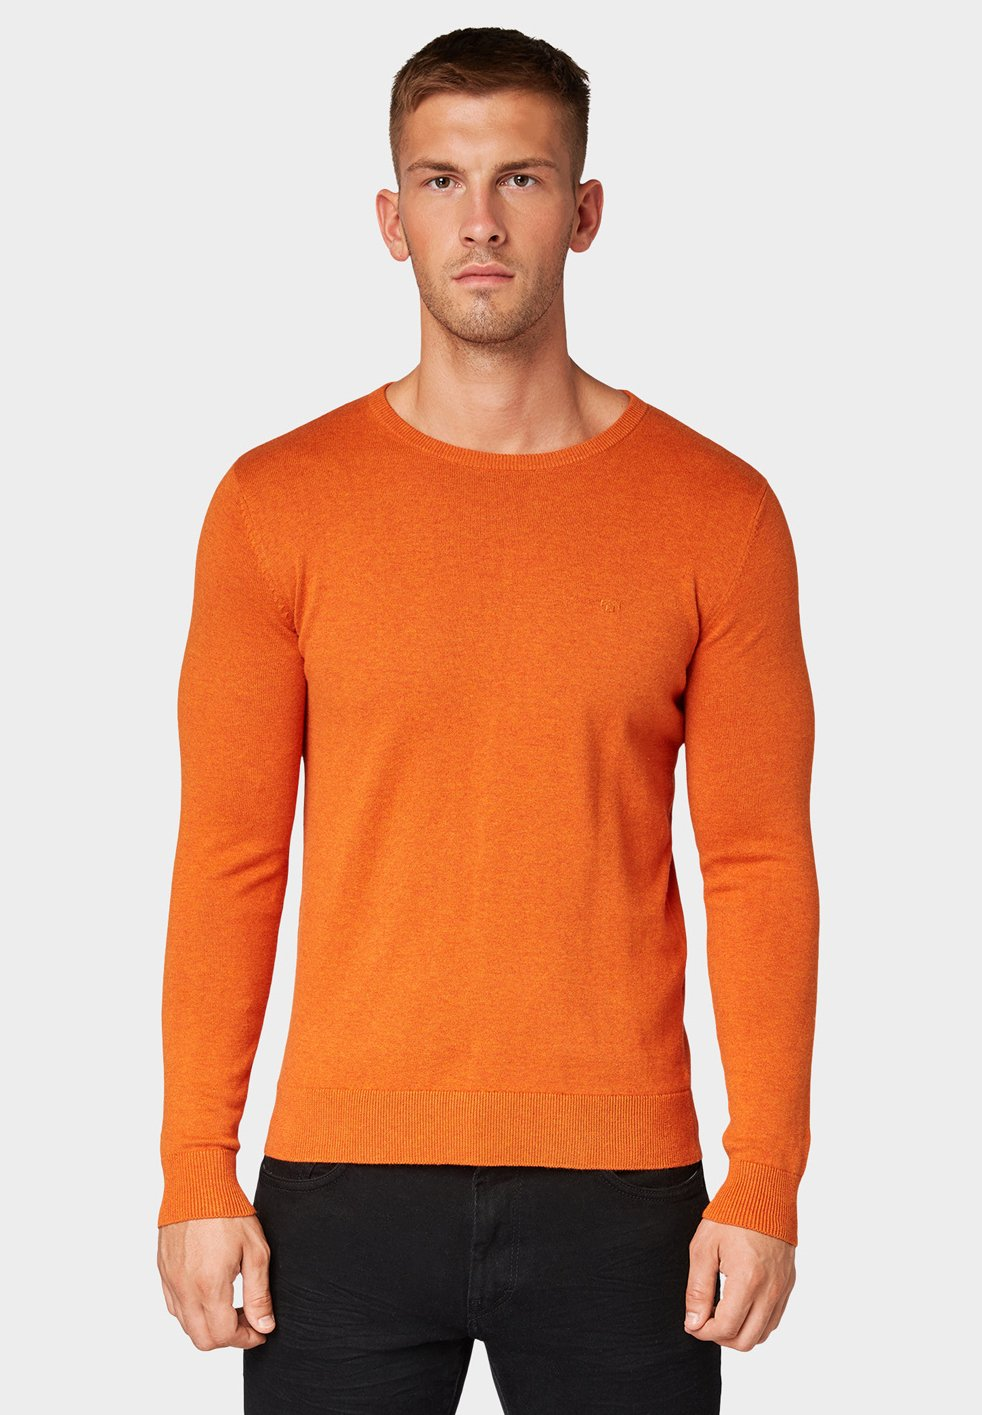 Tom Tailor Basic Crew Neck - Strickpullover Heated Orange Melange